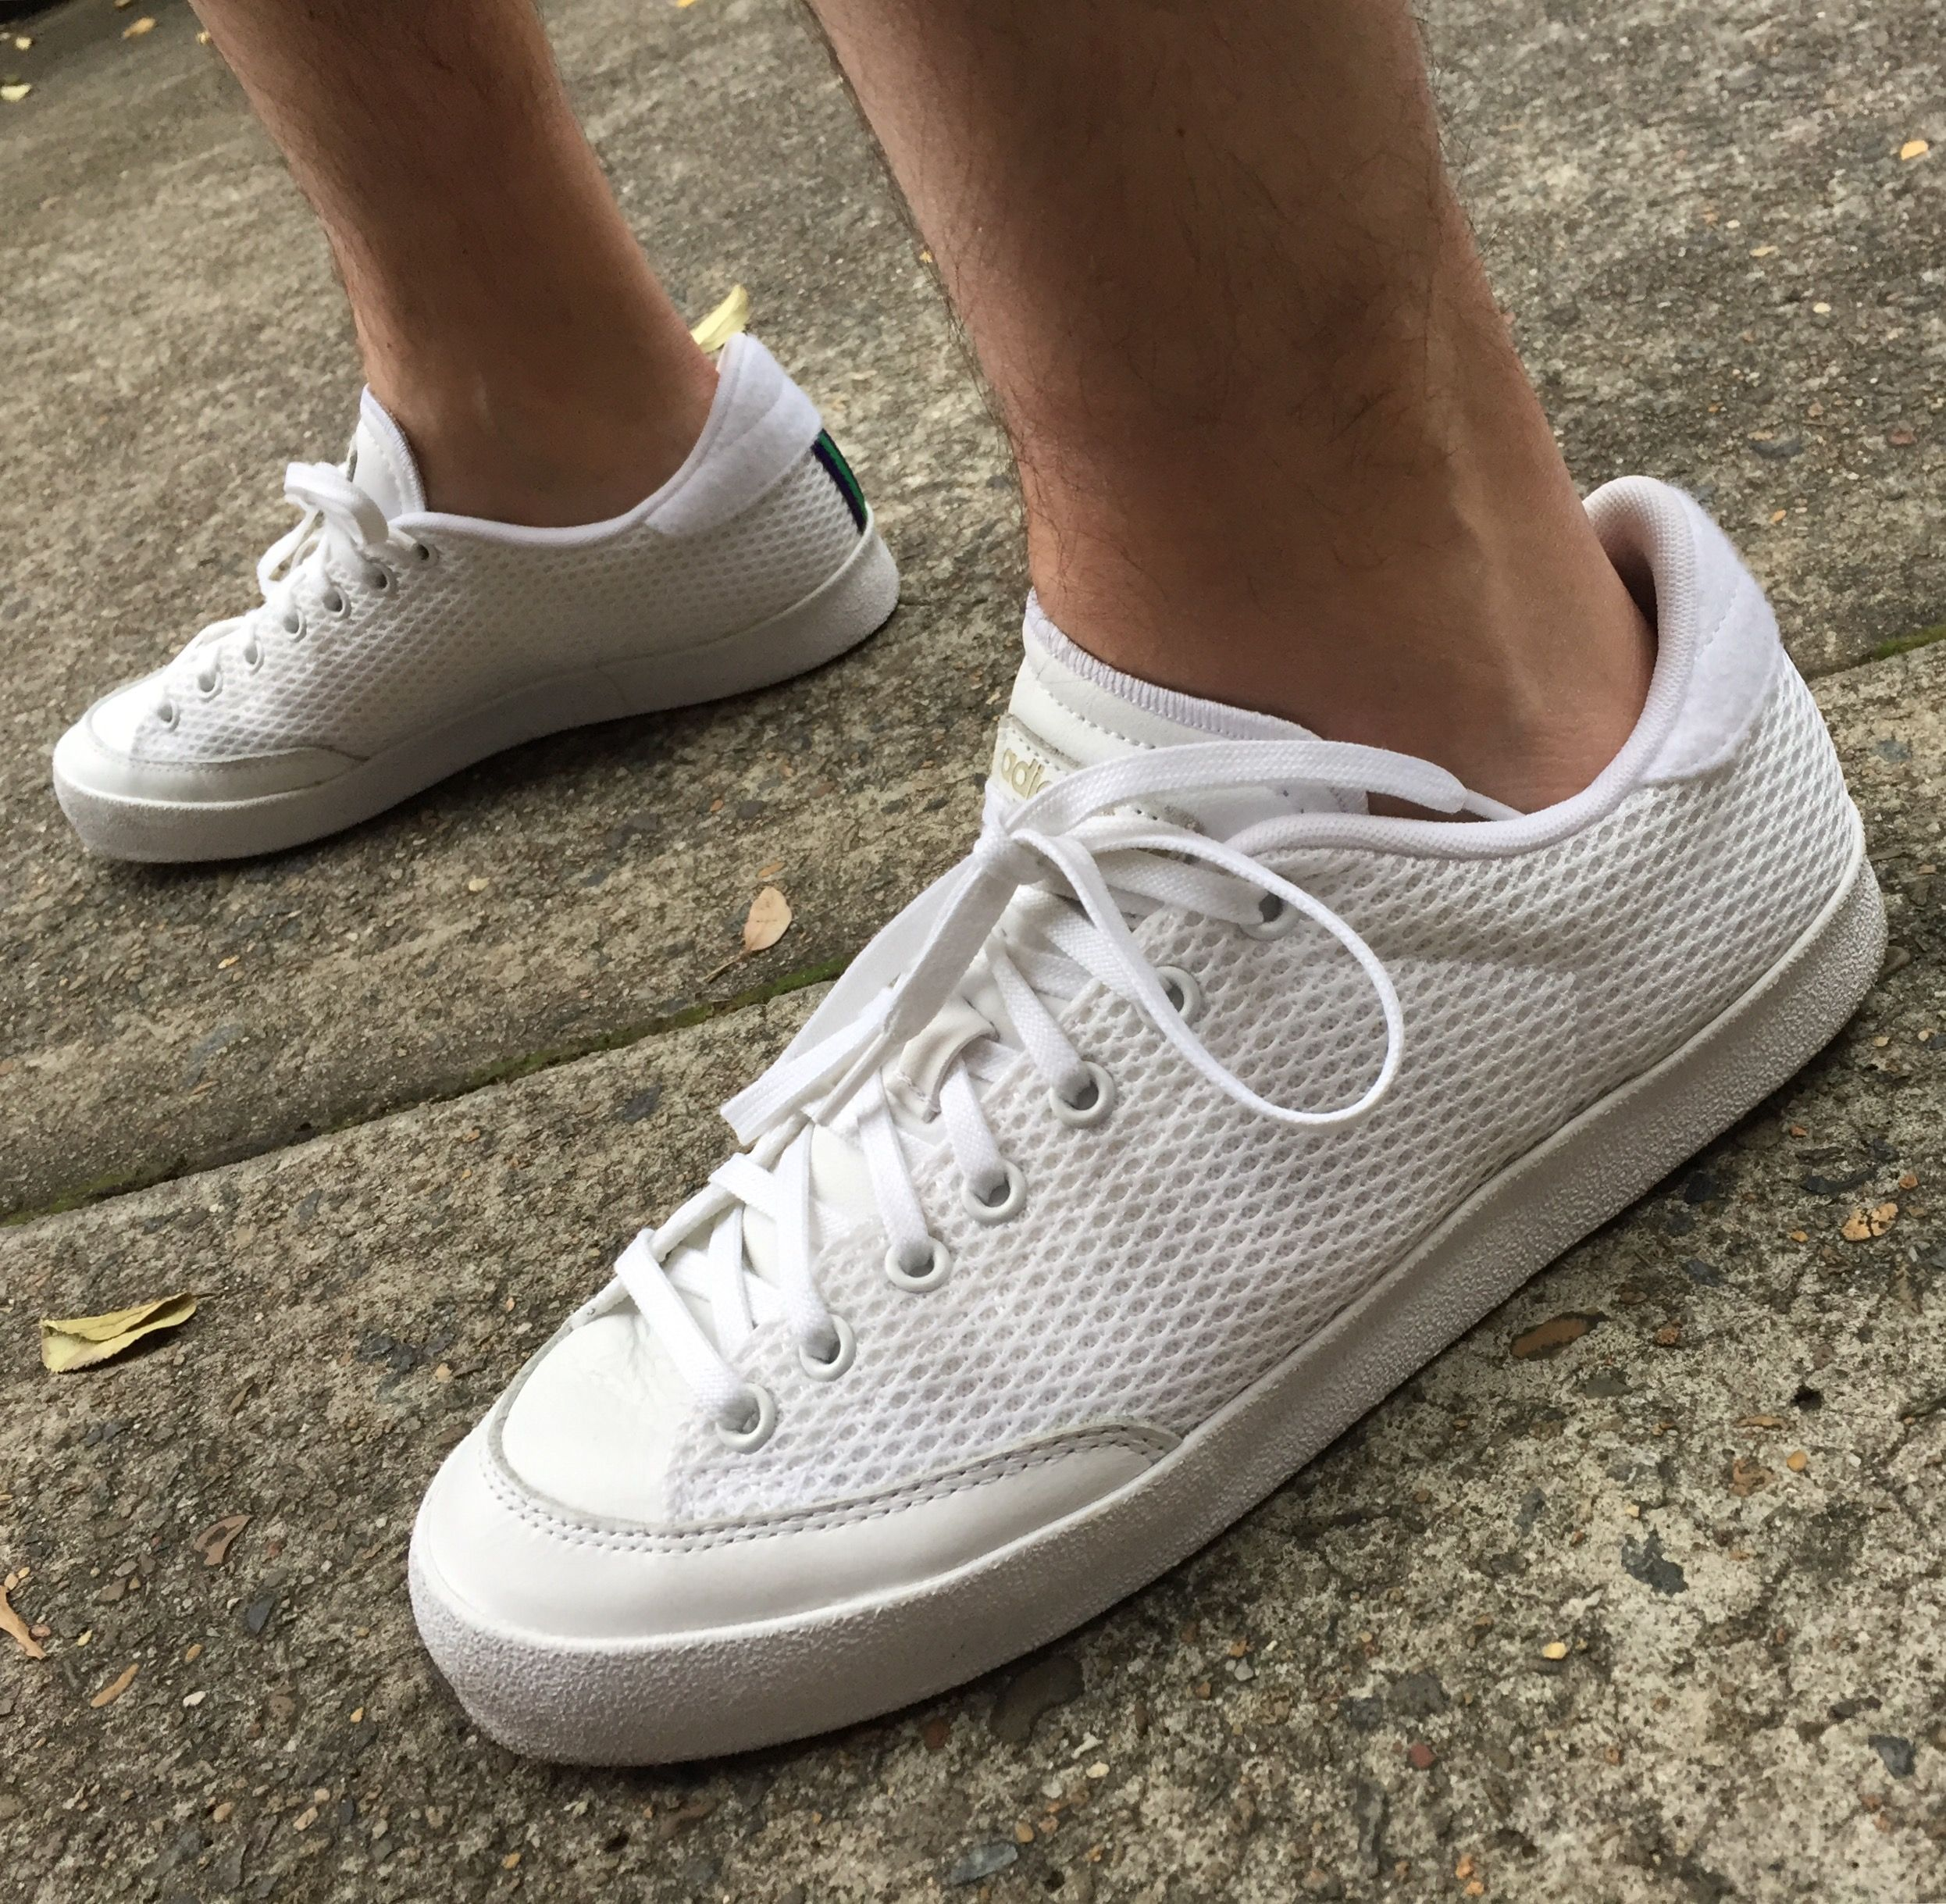 Adidas Originals Rod Laver 'Wimbledon Collection' zapatos: adidas